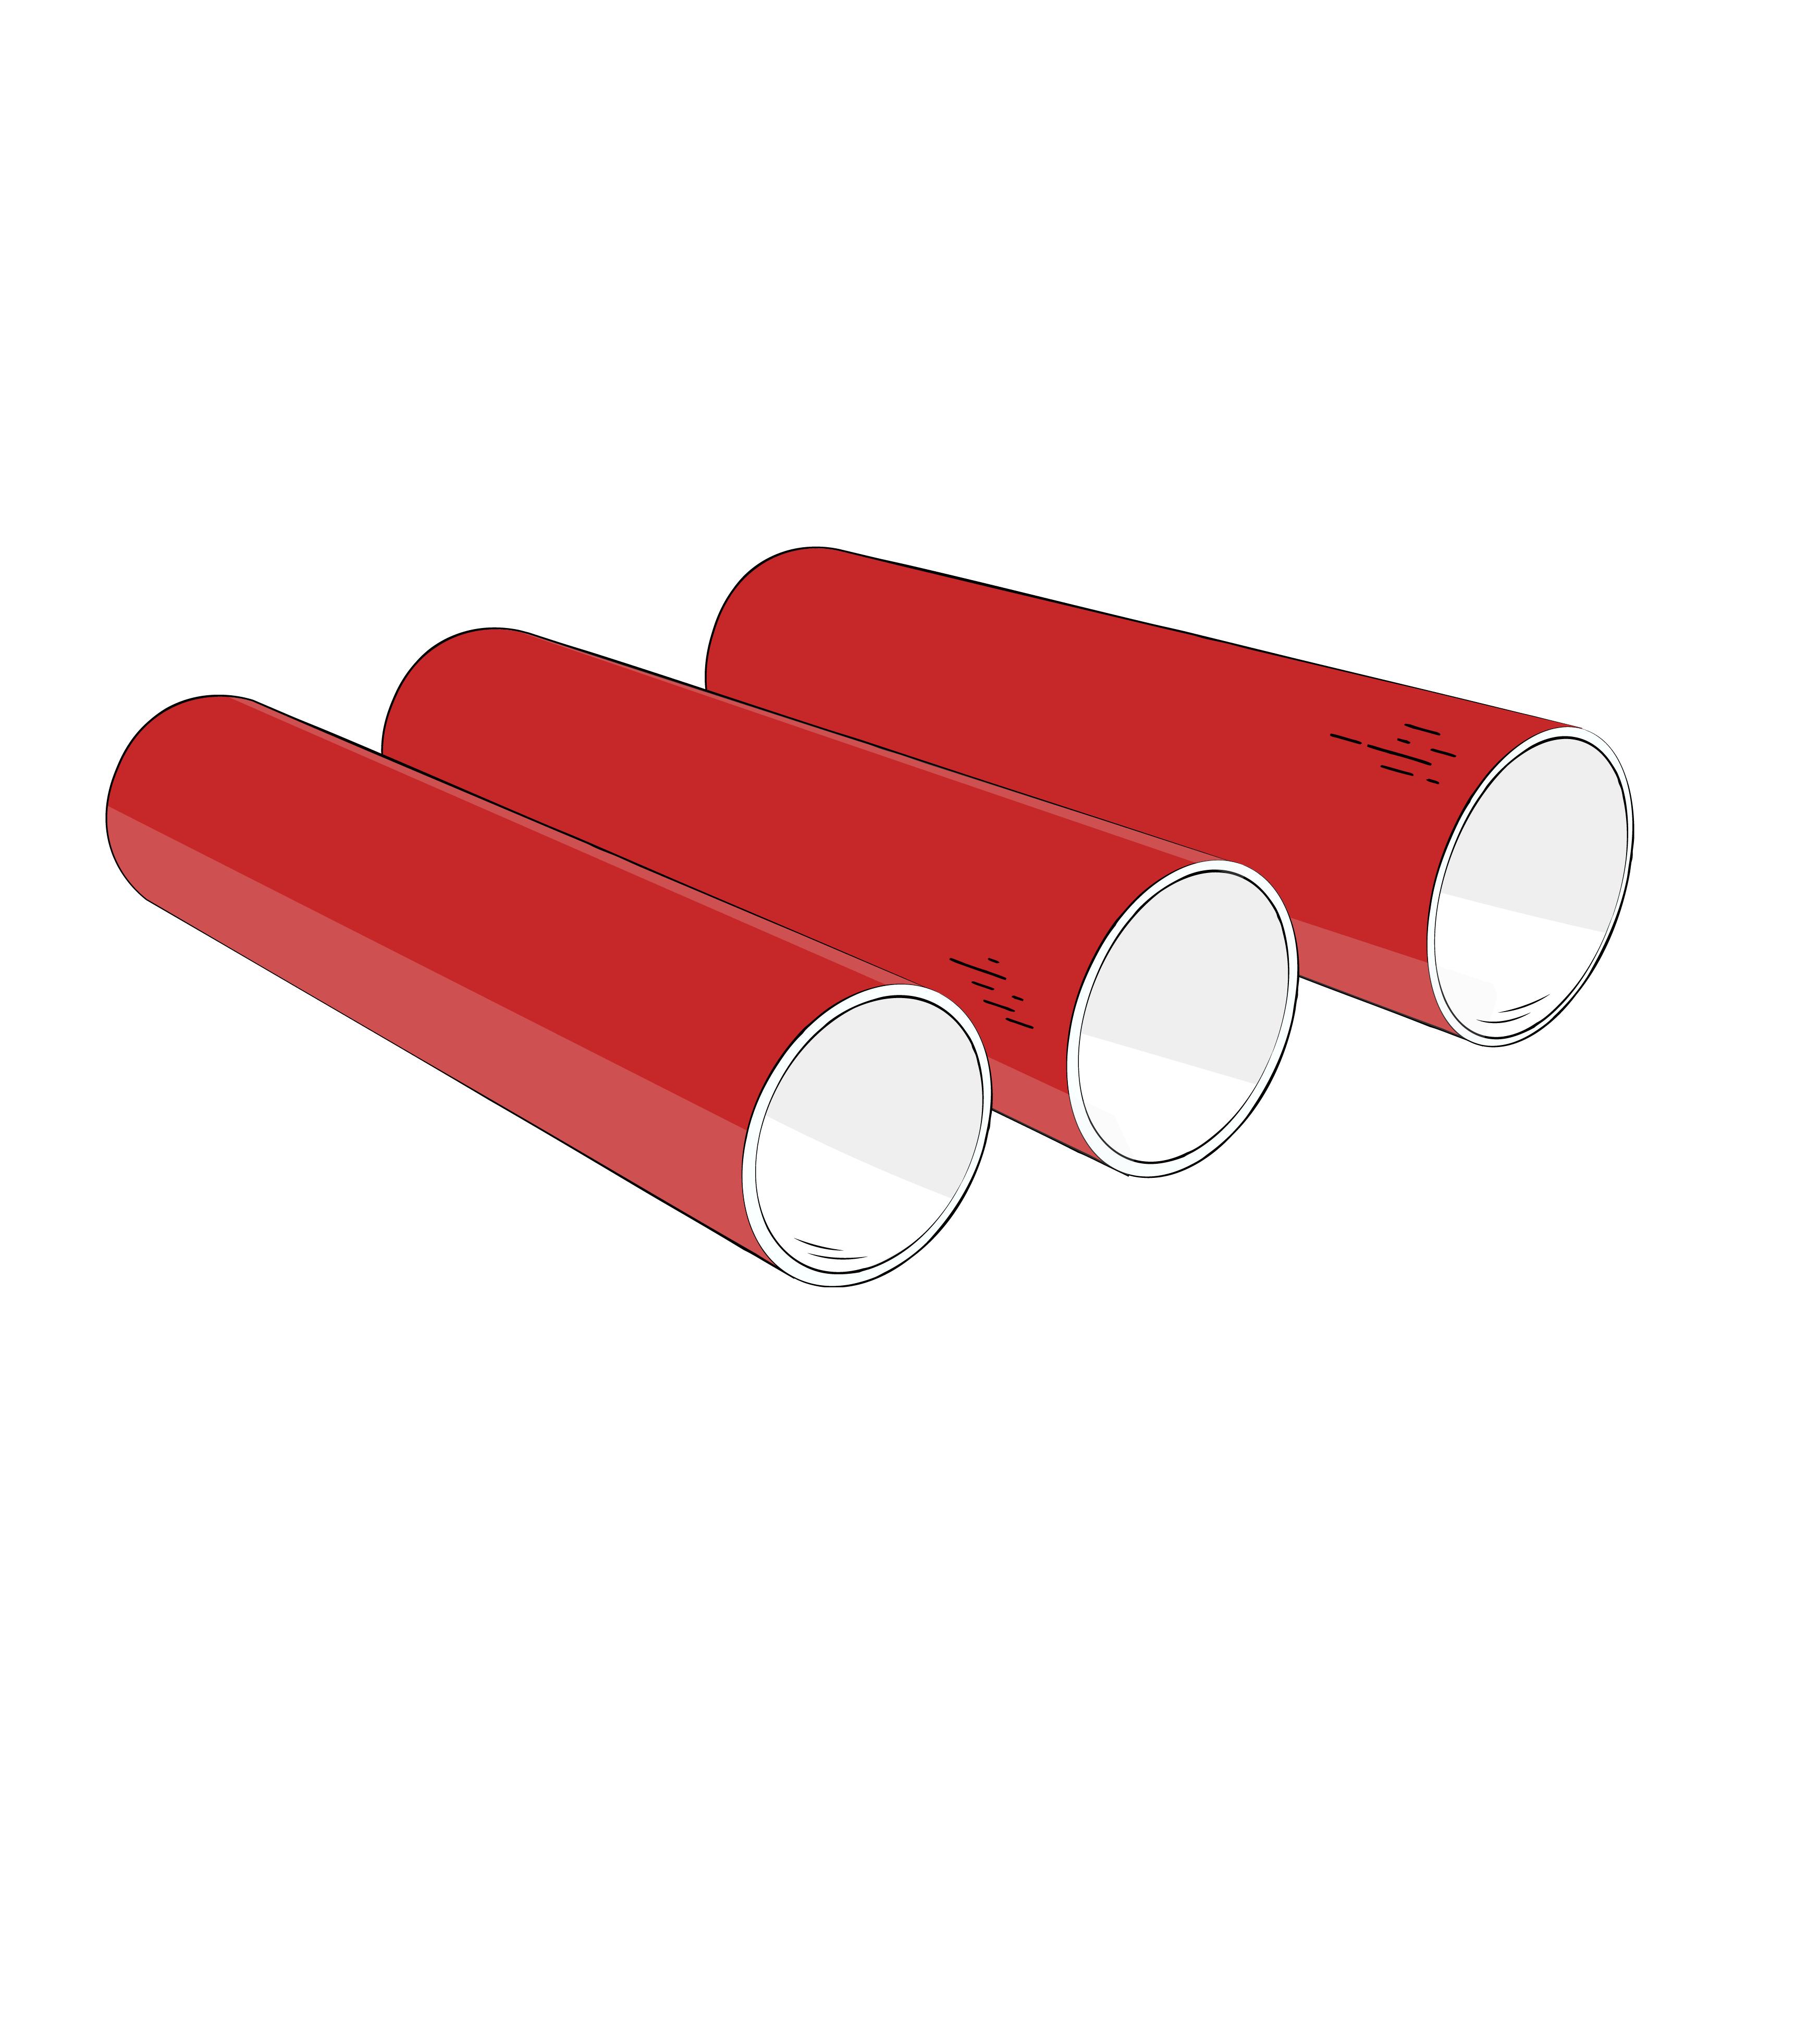 трехслойная труба ПНД